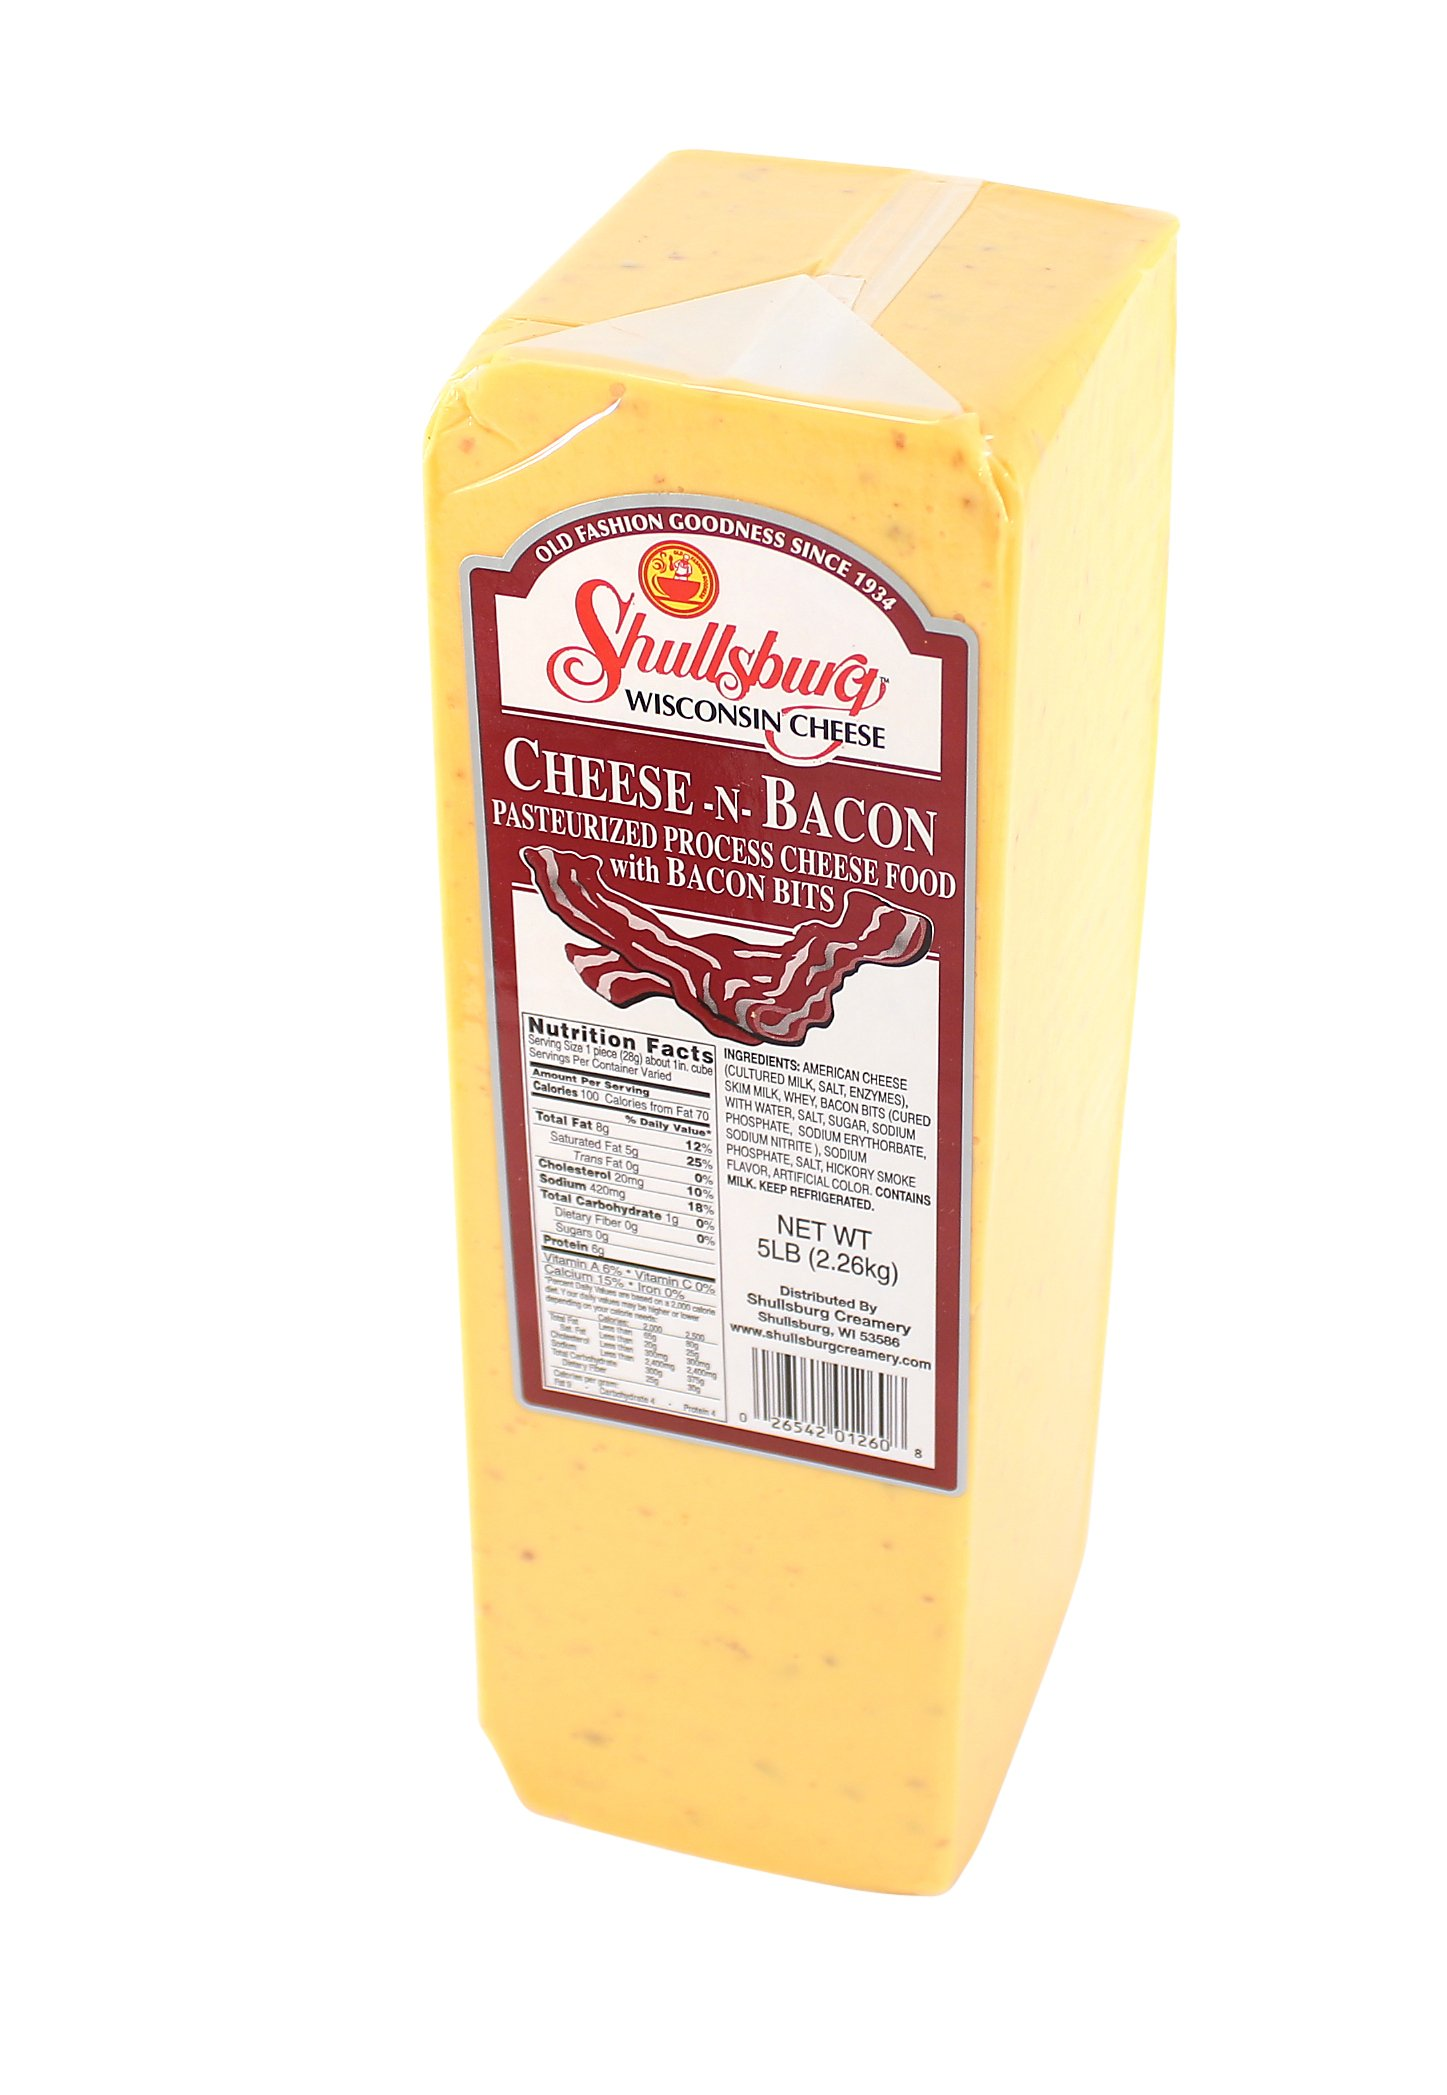 Shullsburg Creamery - Cheese-N-Bacon - 5 Pound Loaf